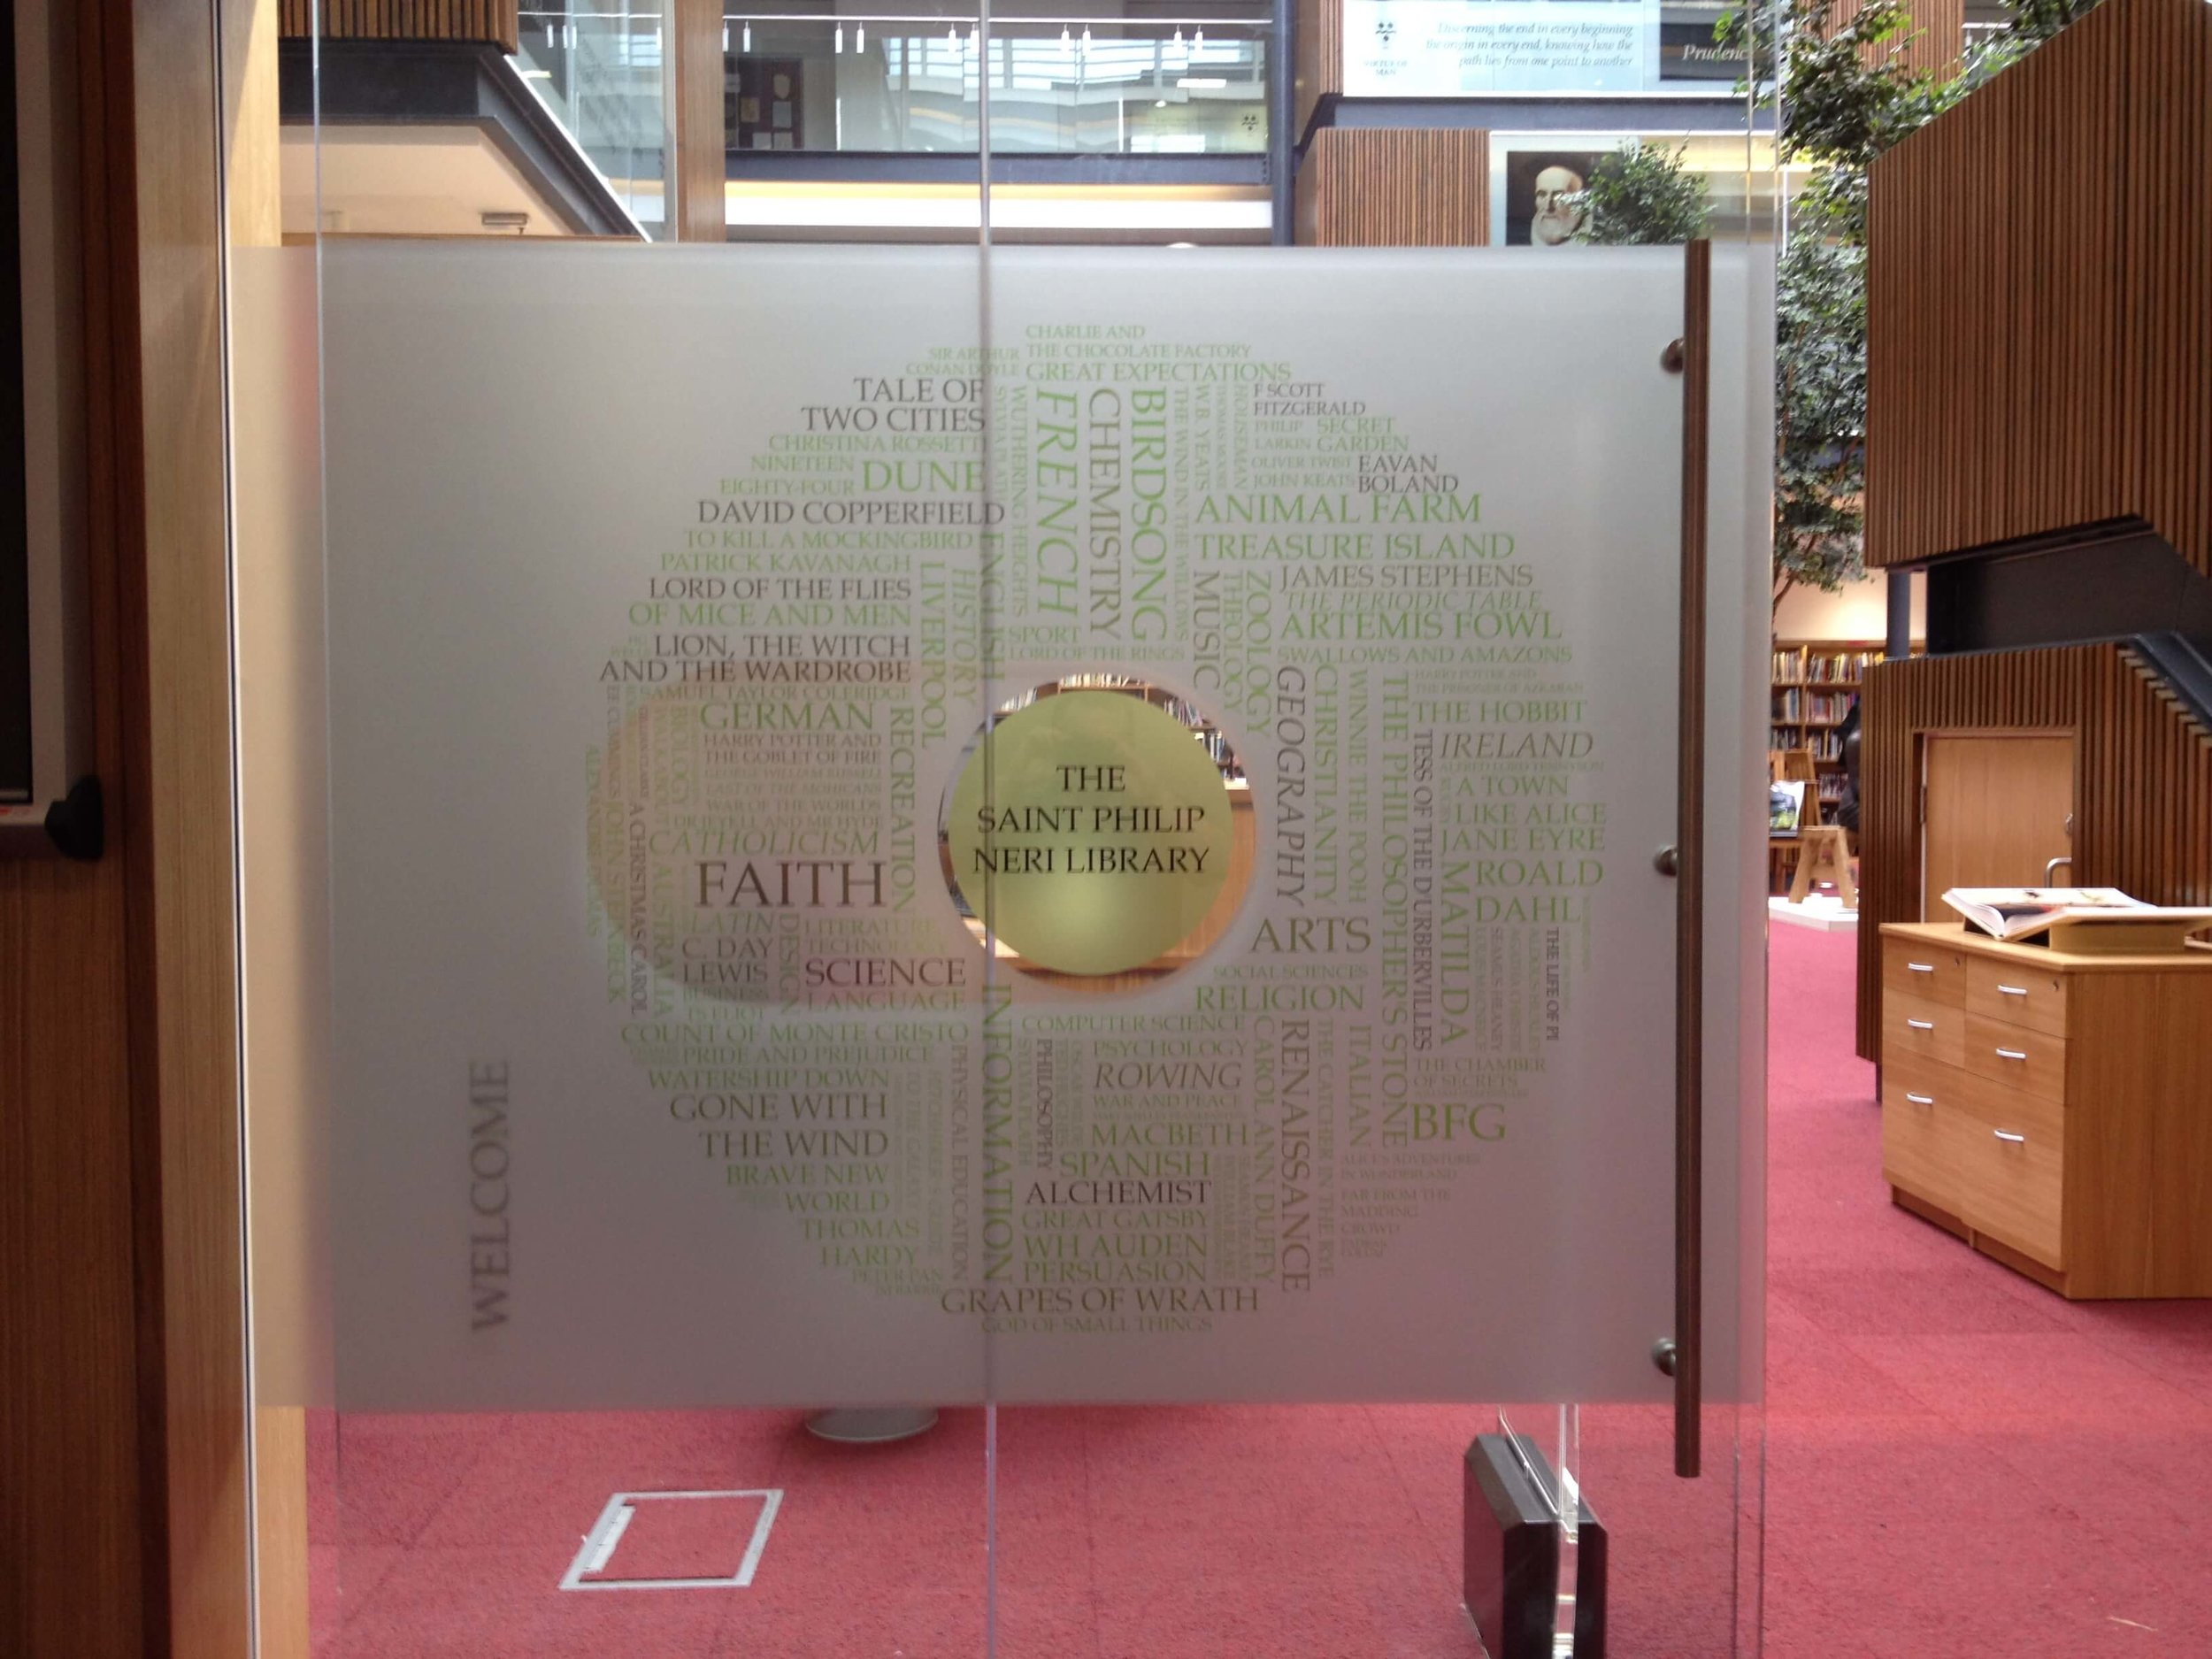 london_oratory_school_window_graphics_09.JPG